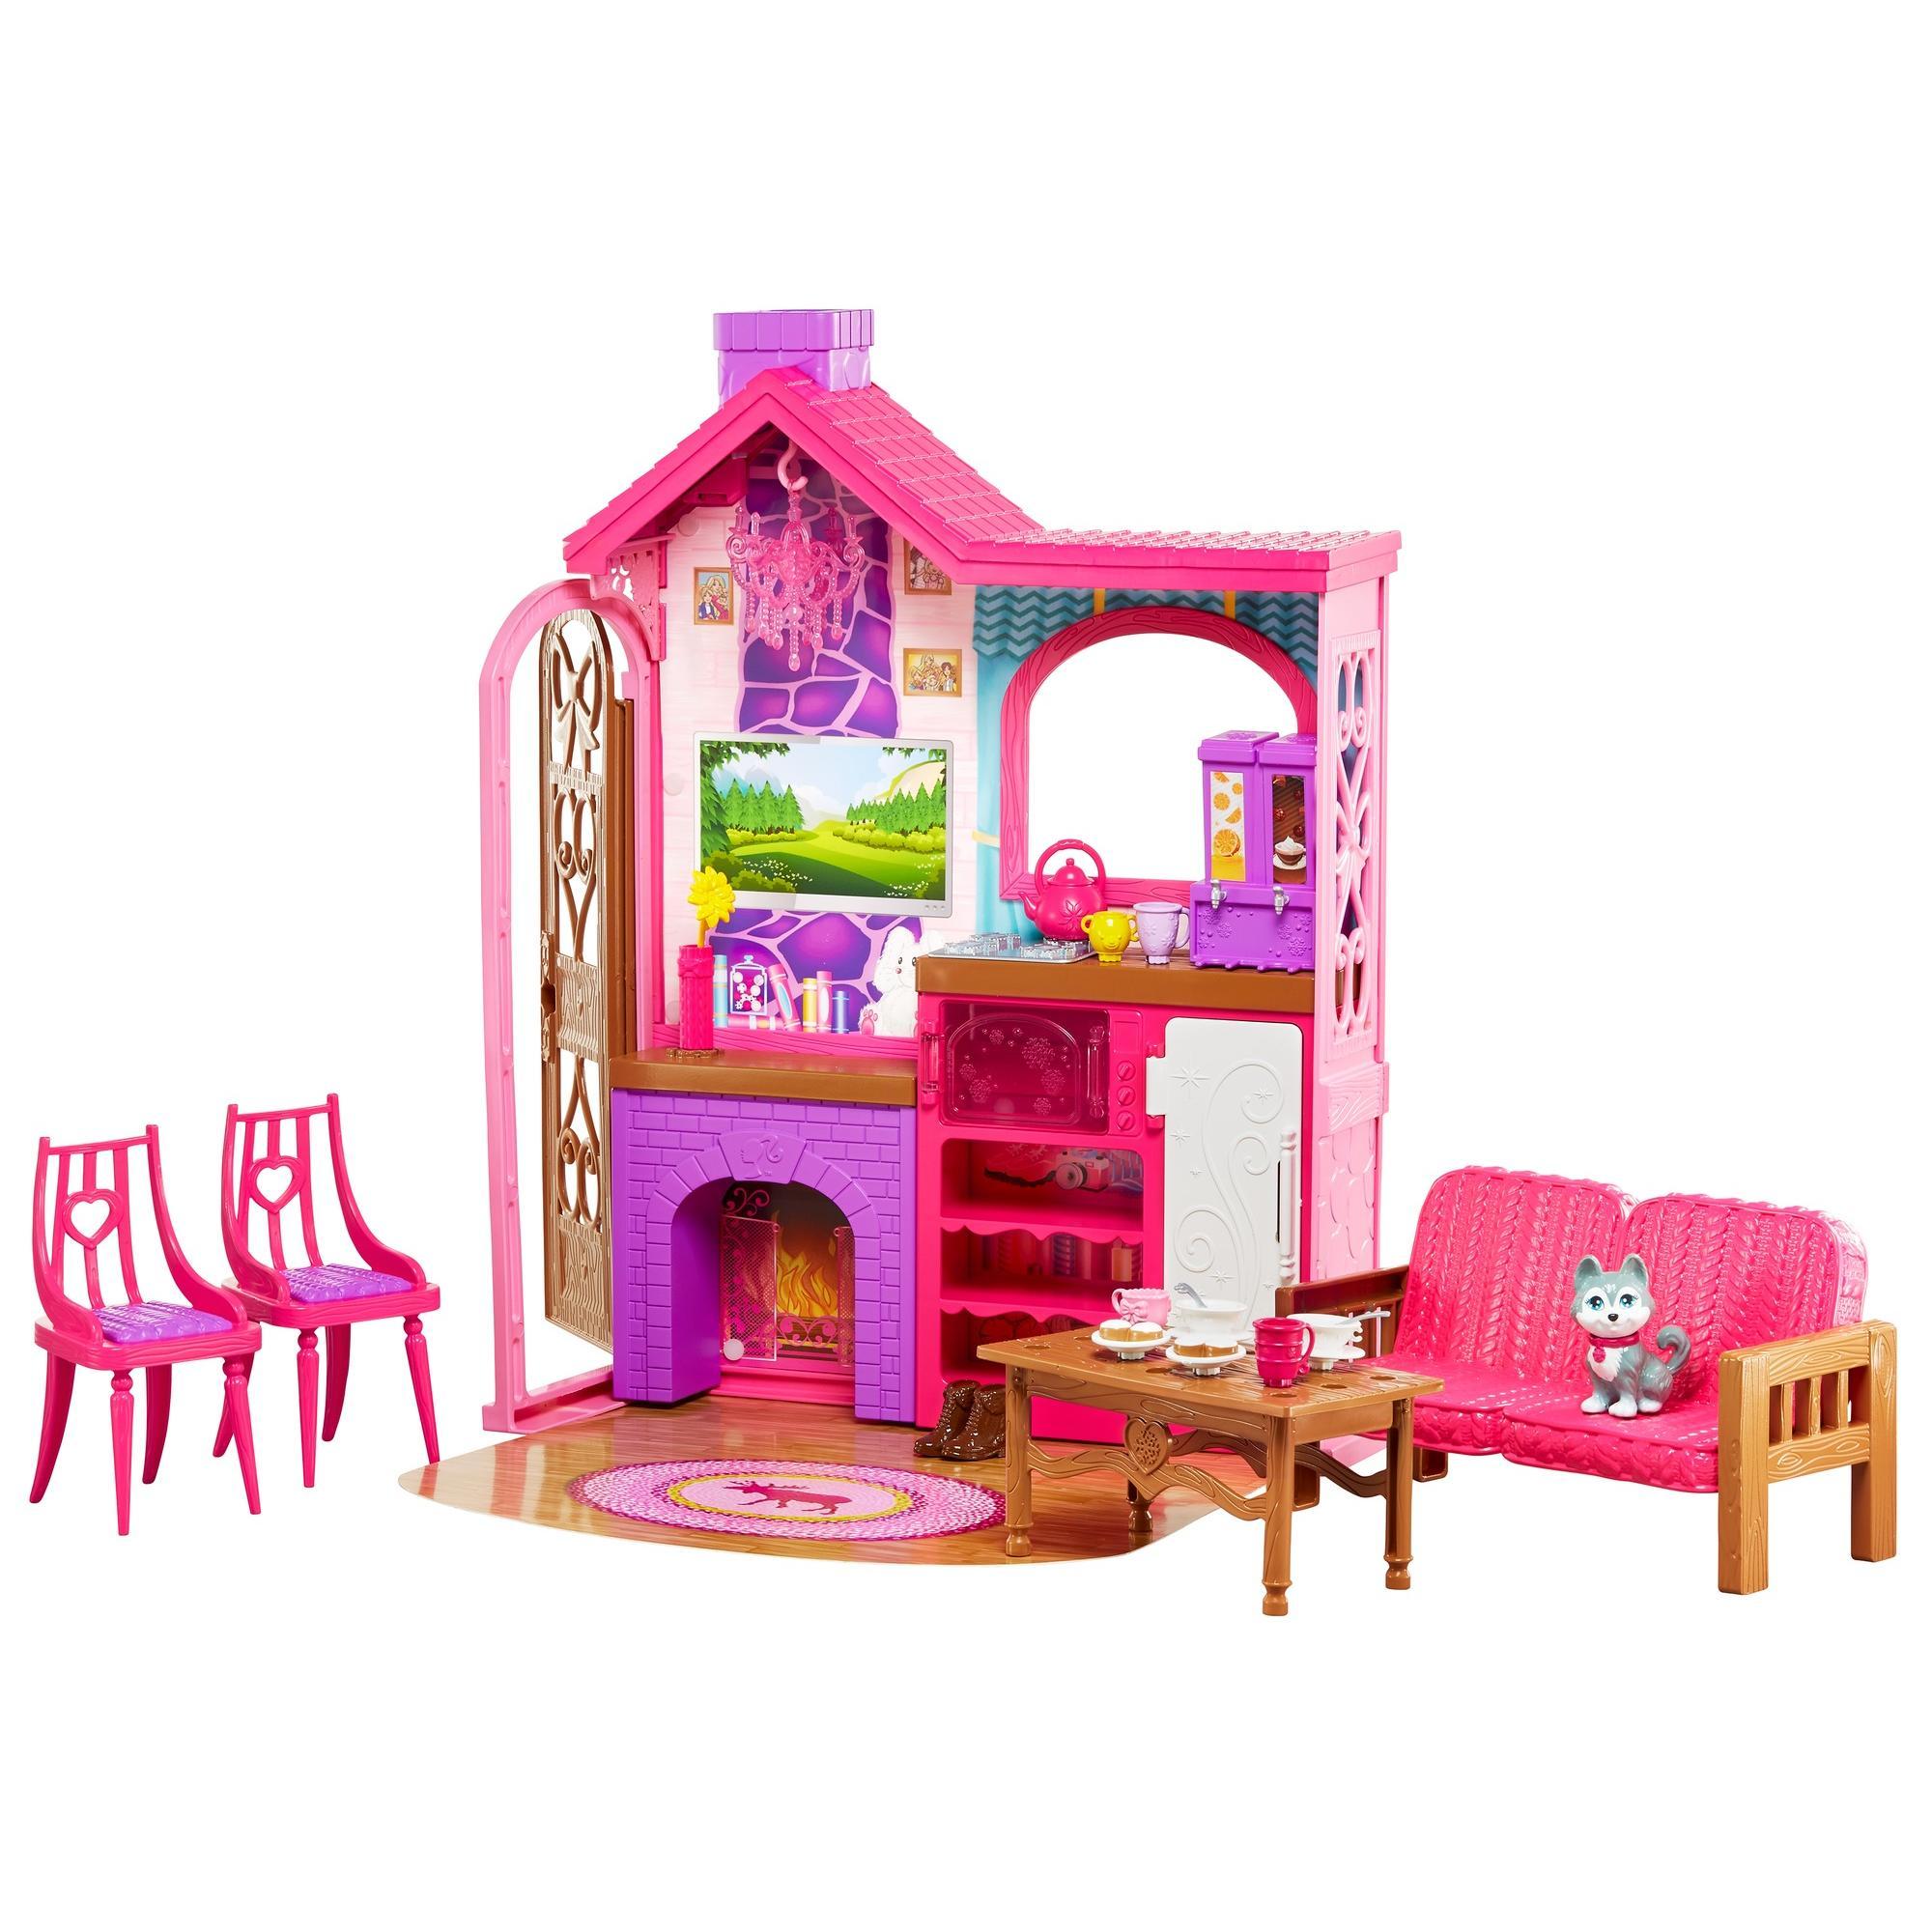 Barbie Camping Fun Playset with Barbie Cabin, Furniture, Puppy & Accessories